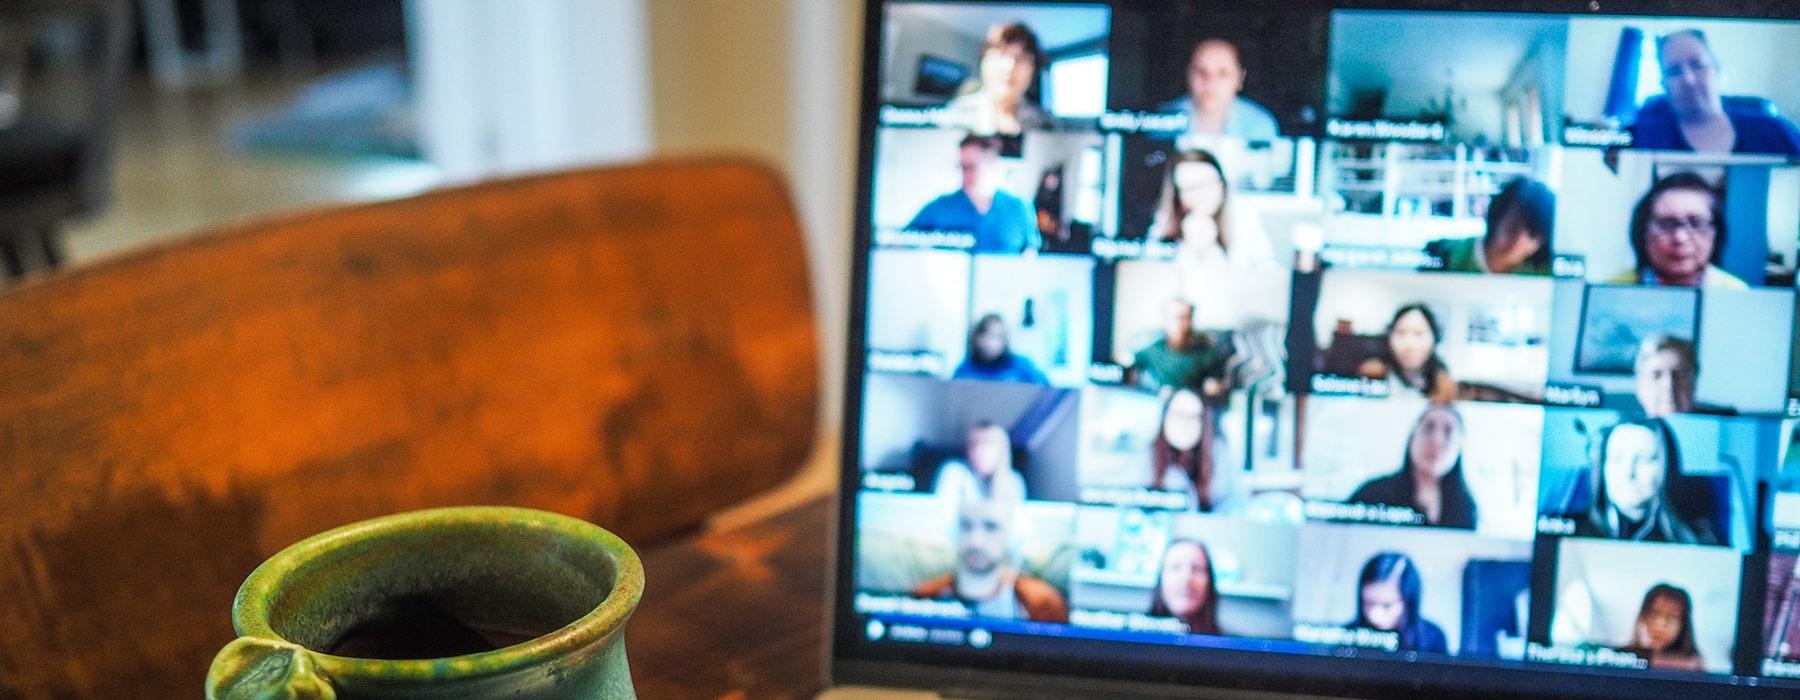 virtual team meeting on laptop